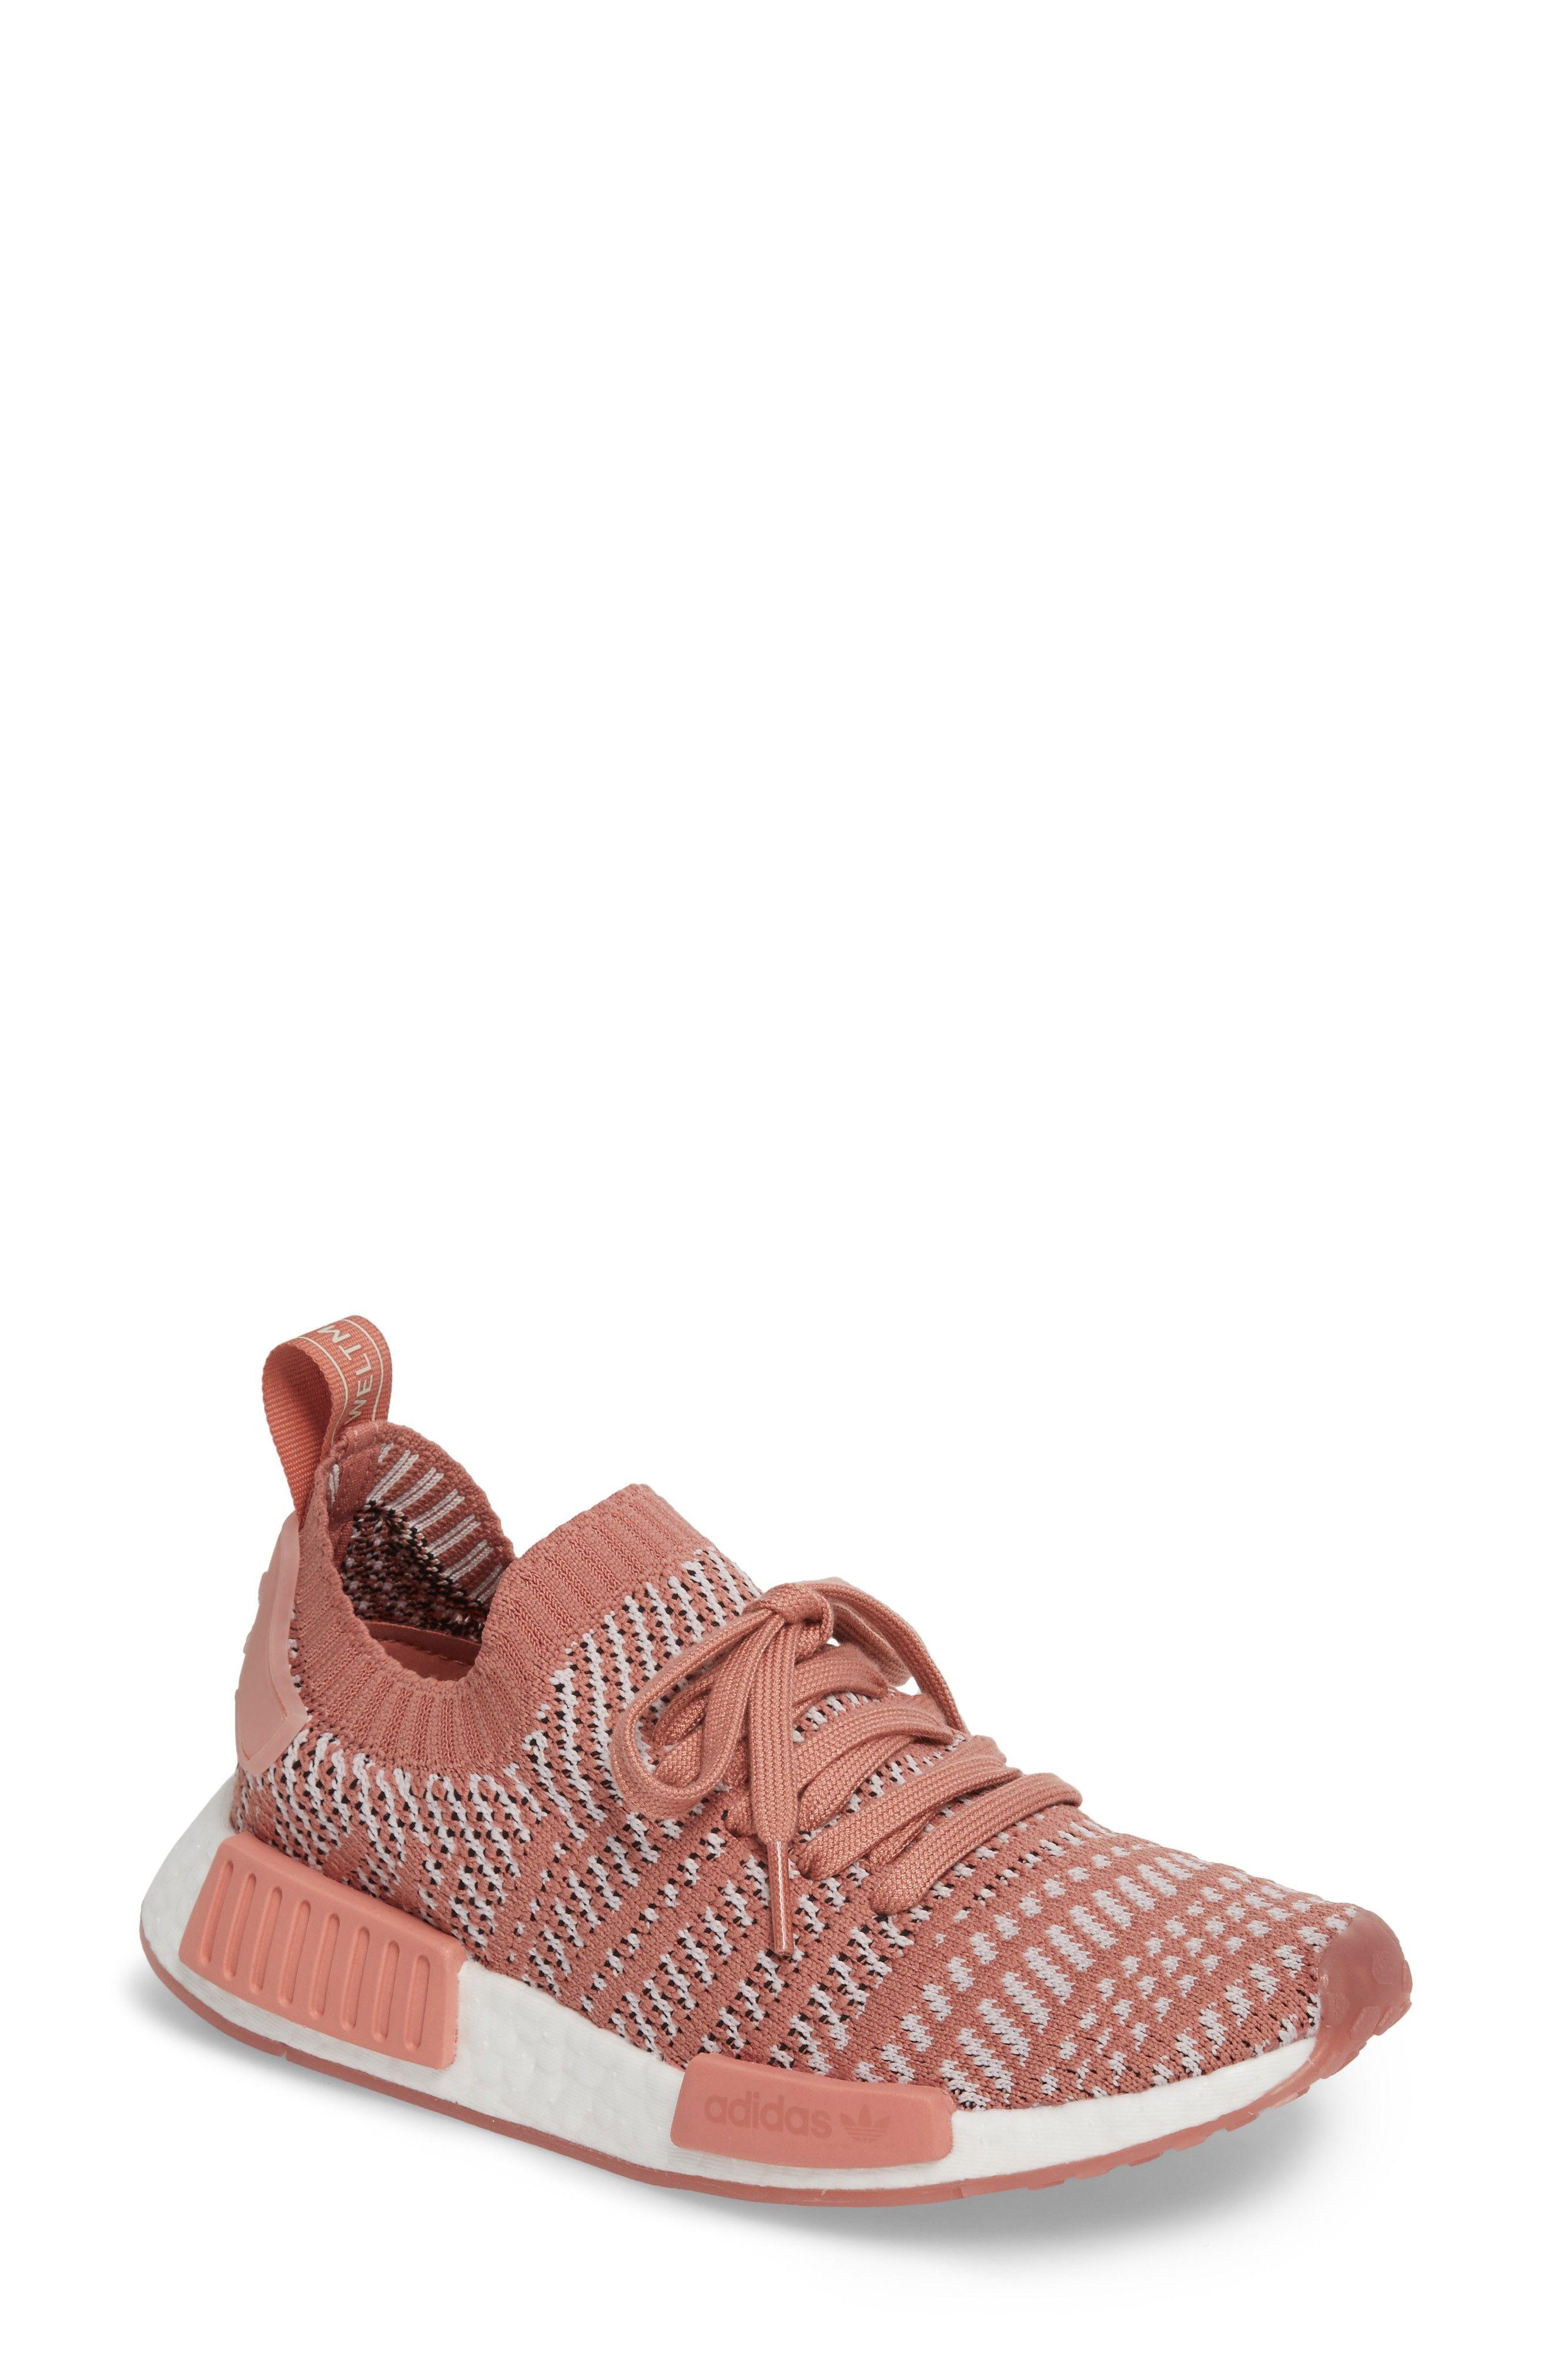 adidas rosa nmd r1 stlt primeknit scarpe scarpe pinterest nmd